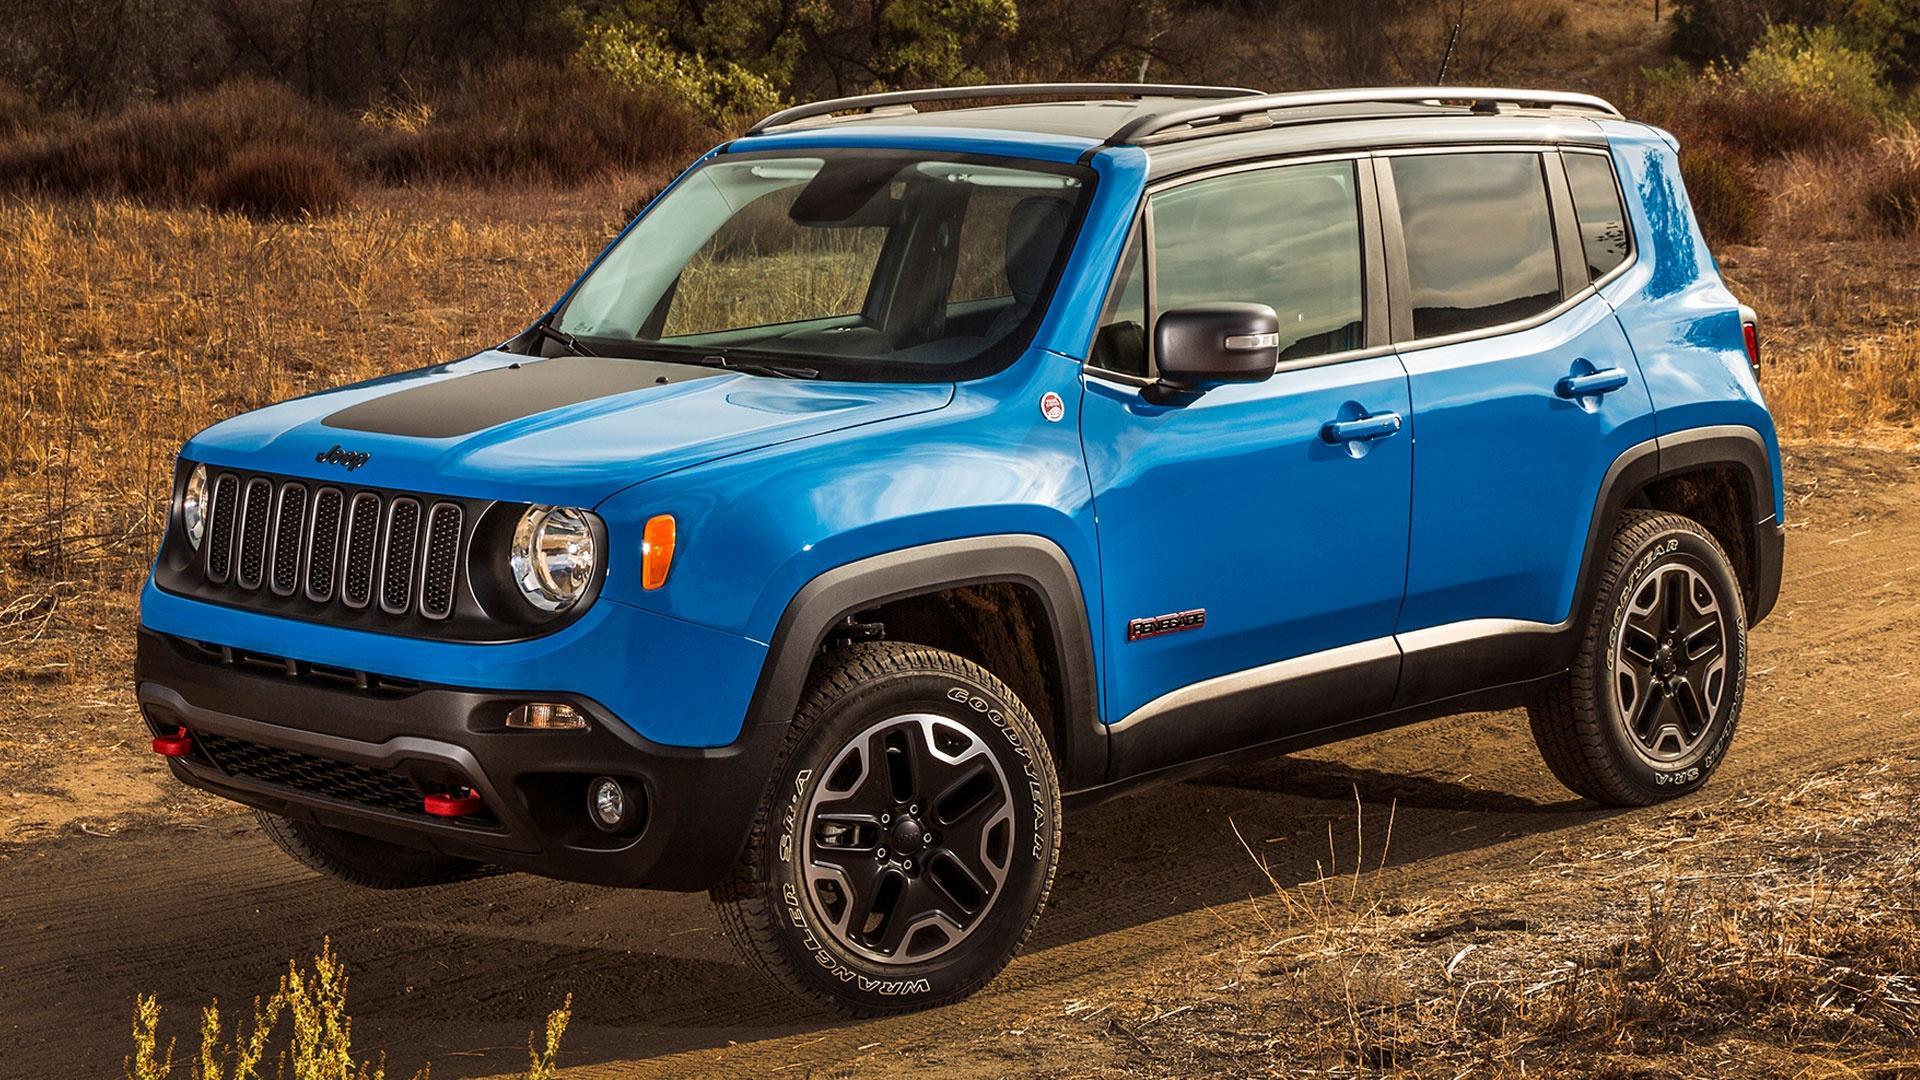 motorweek 2015 jeep renegade 2015 bmw i3 twin cities pbs. Black Bedroom Furniture Sets. Home Design Ideas